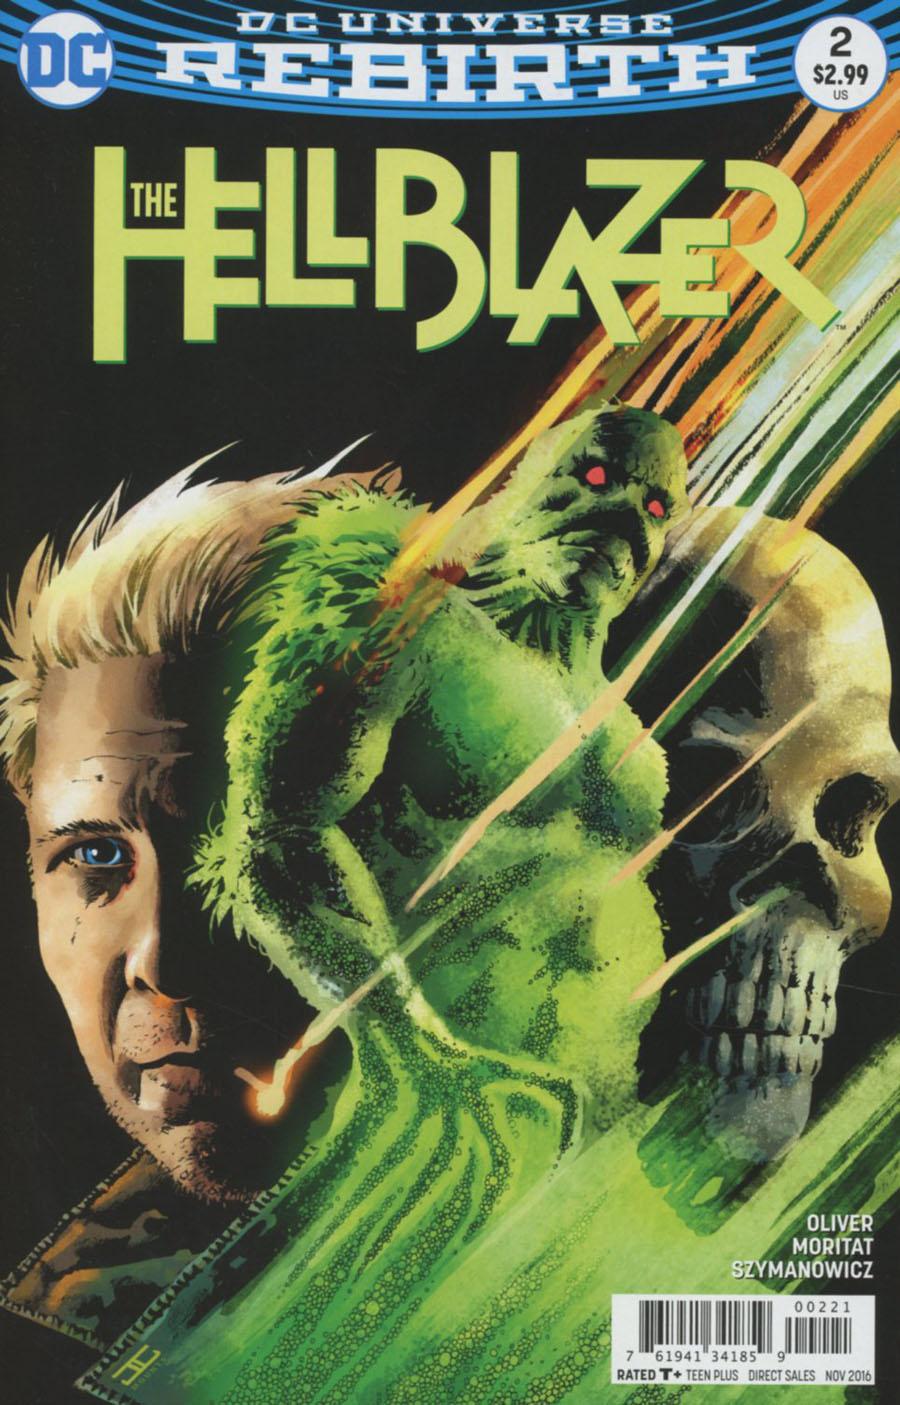 Hellblazer Vol 2 #2 Cover B Variant John Cassaday Cover